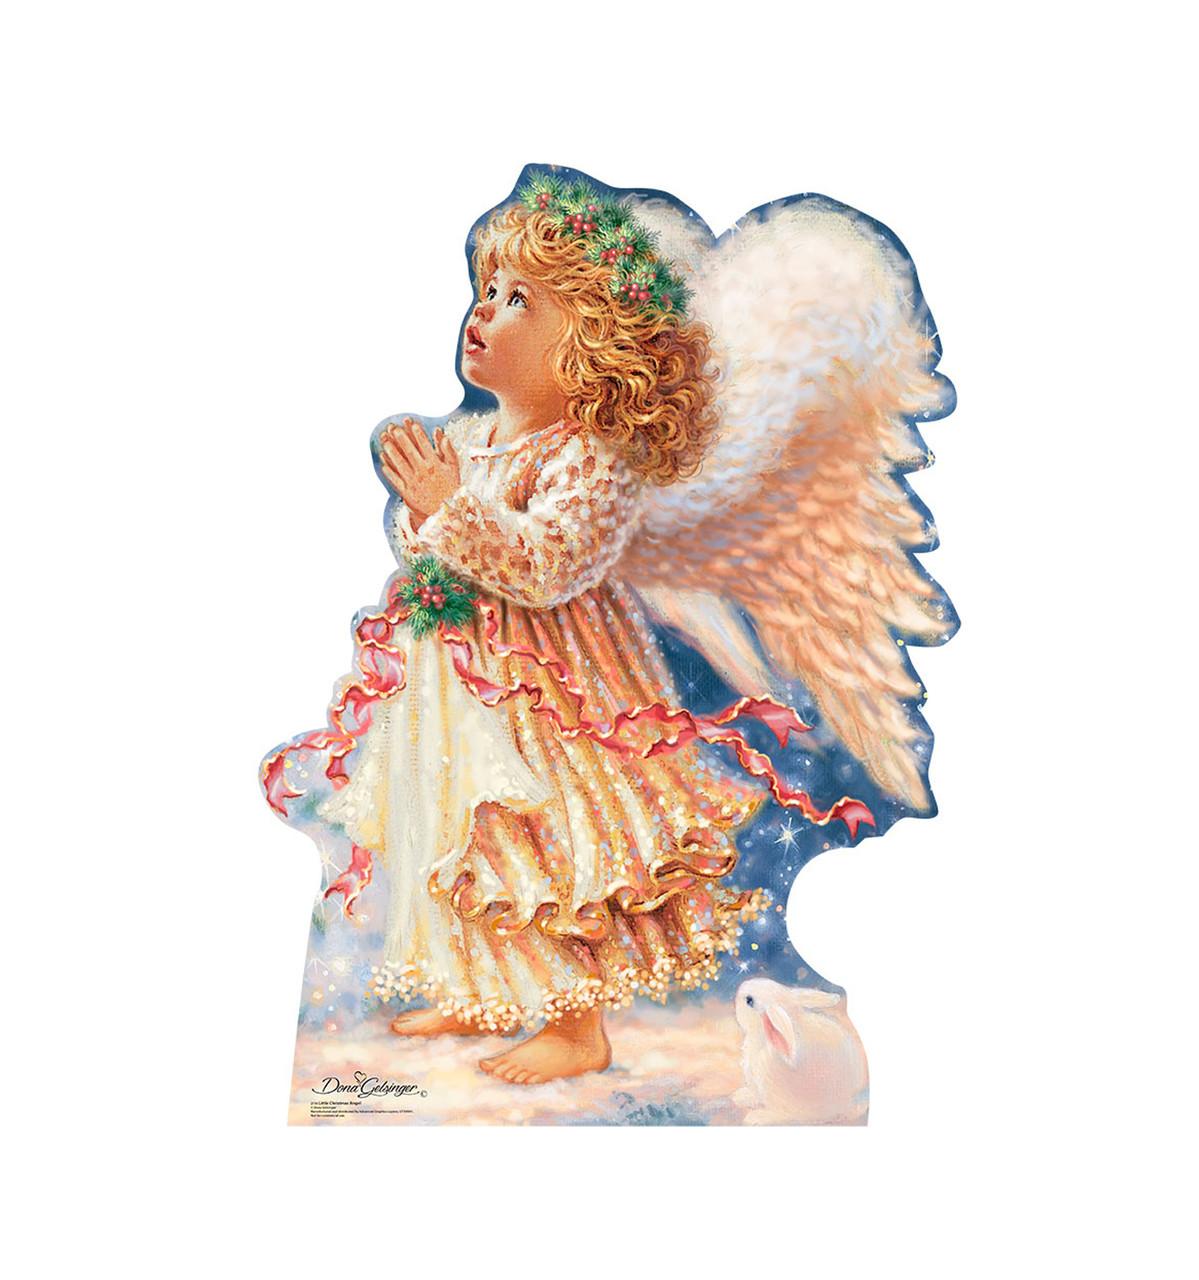 Life-size Little Christmas Angel - Dona Gelsinger Cardboard Standup